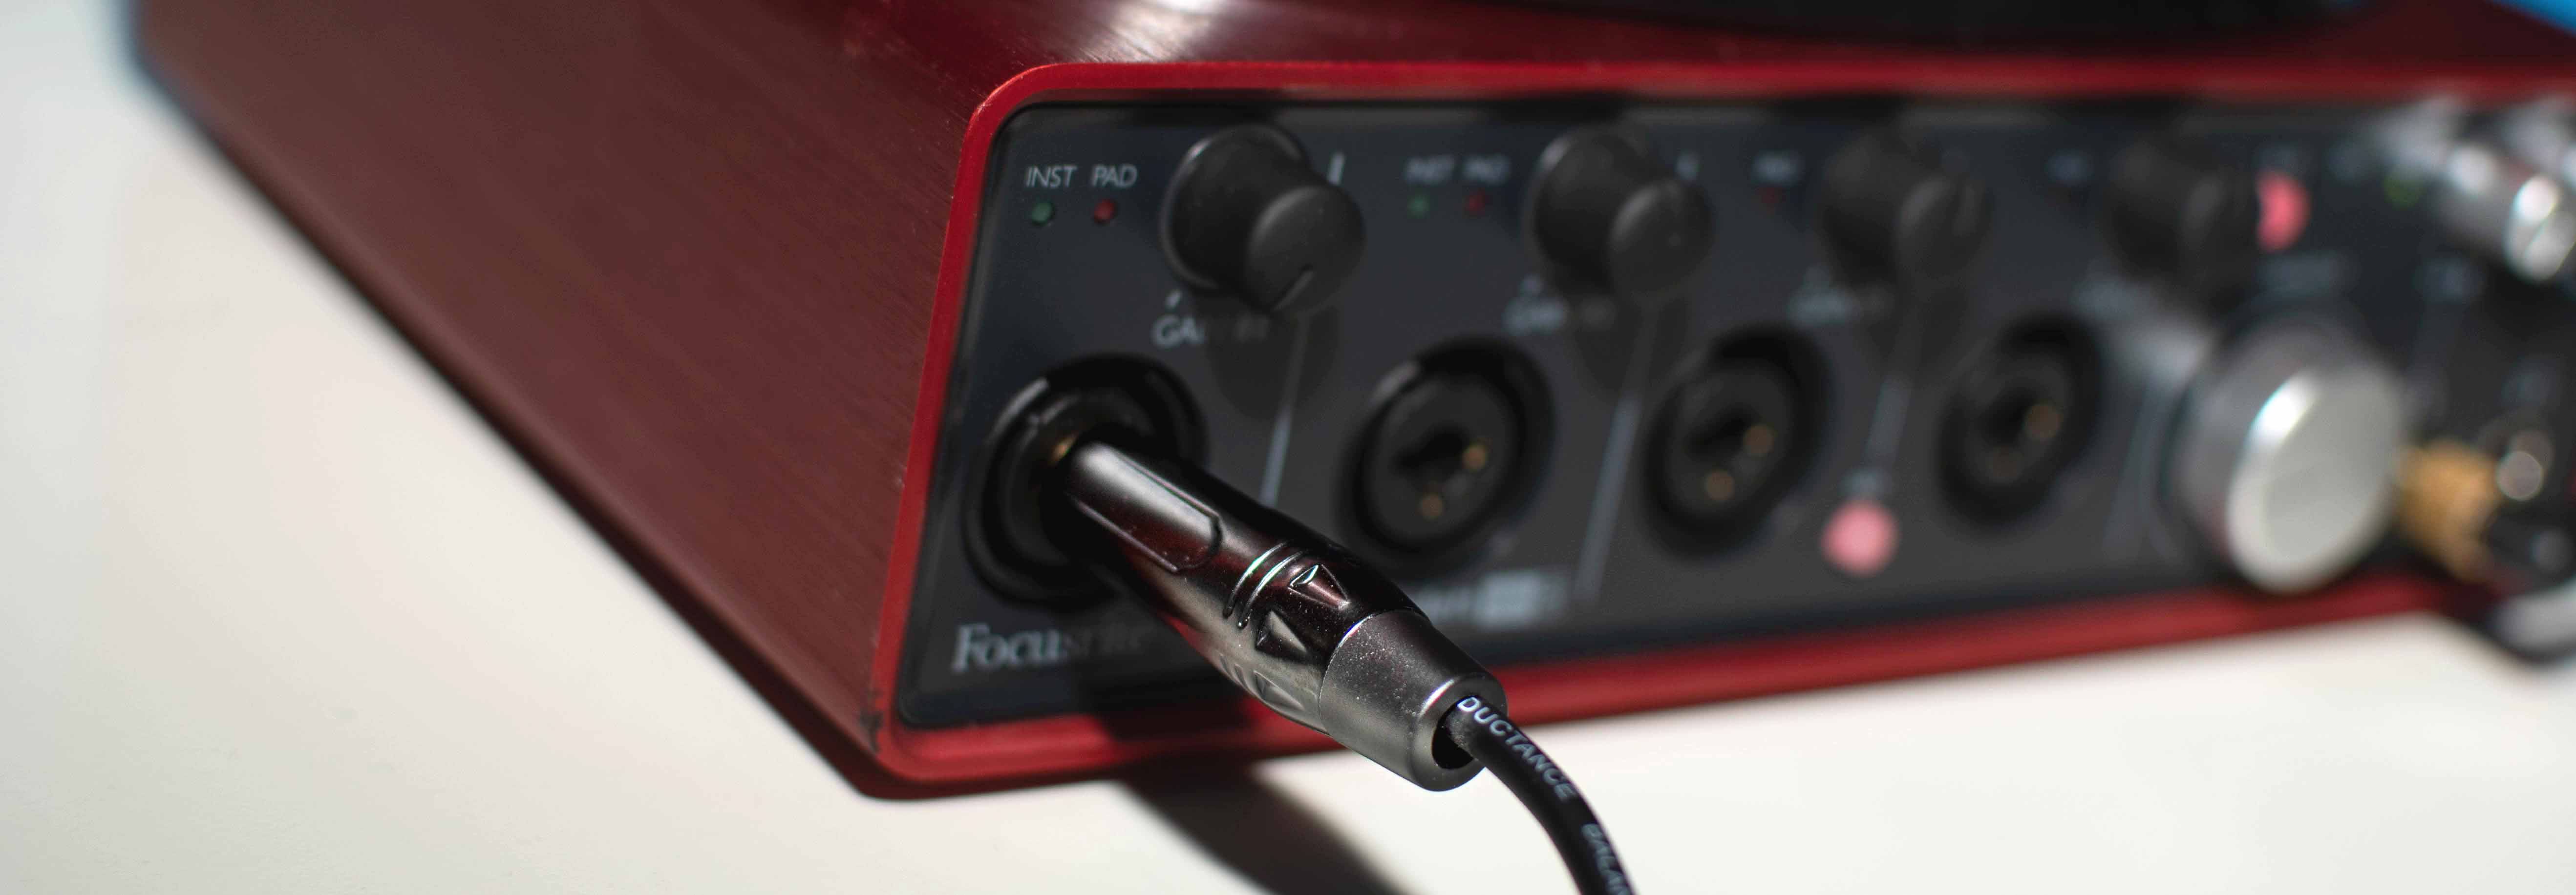 cavo quik lok just RCA per casse, mixer e impianti stereo hi-fi